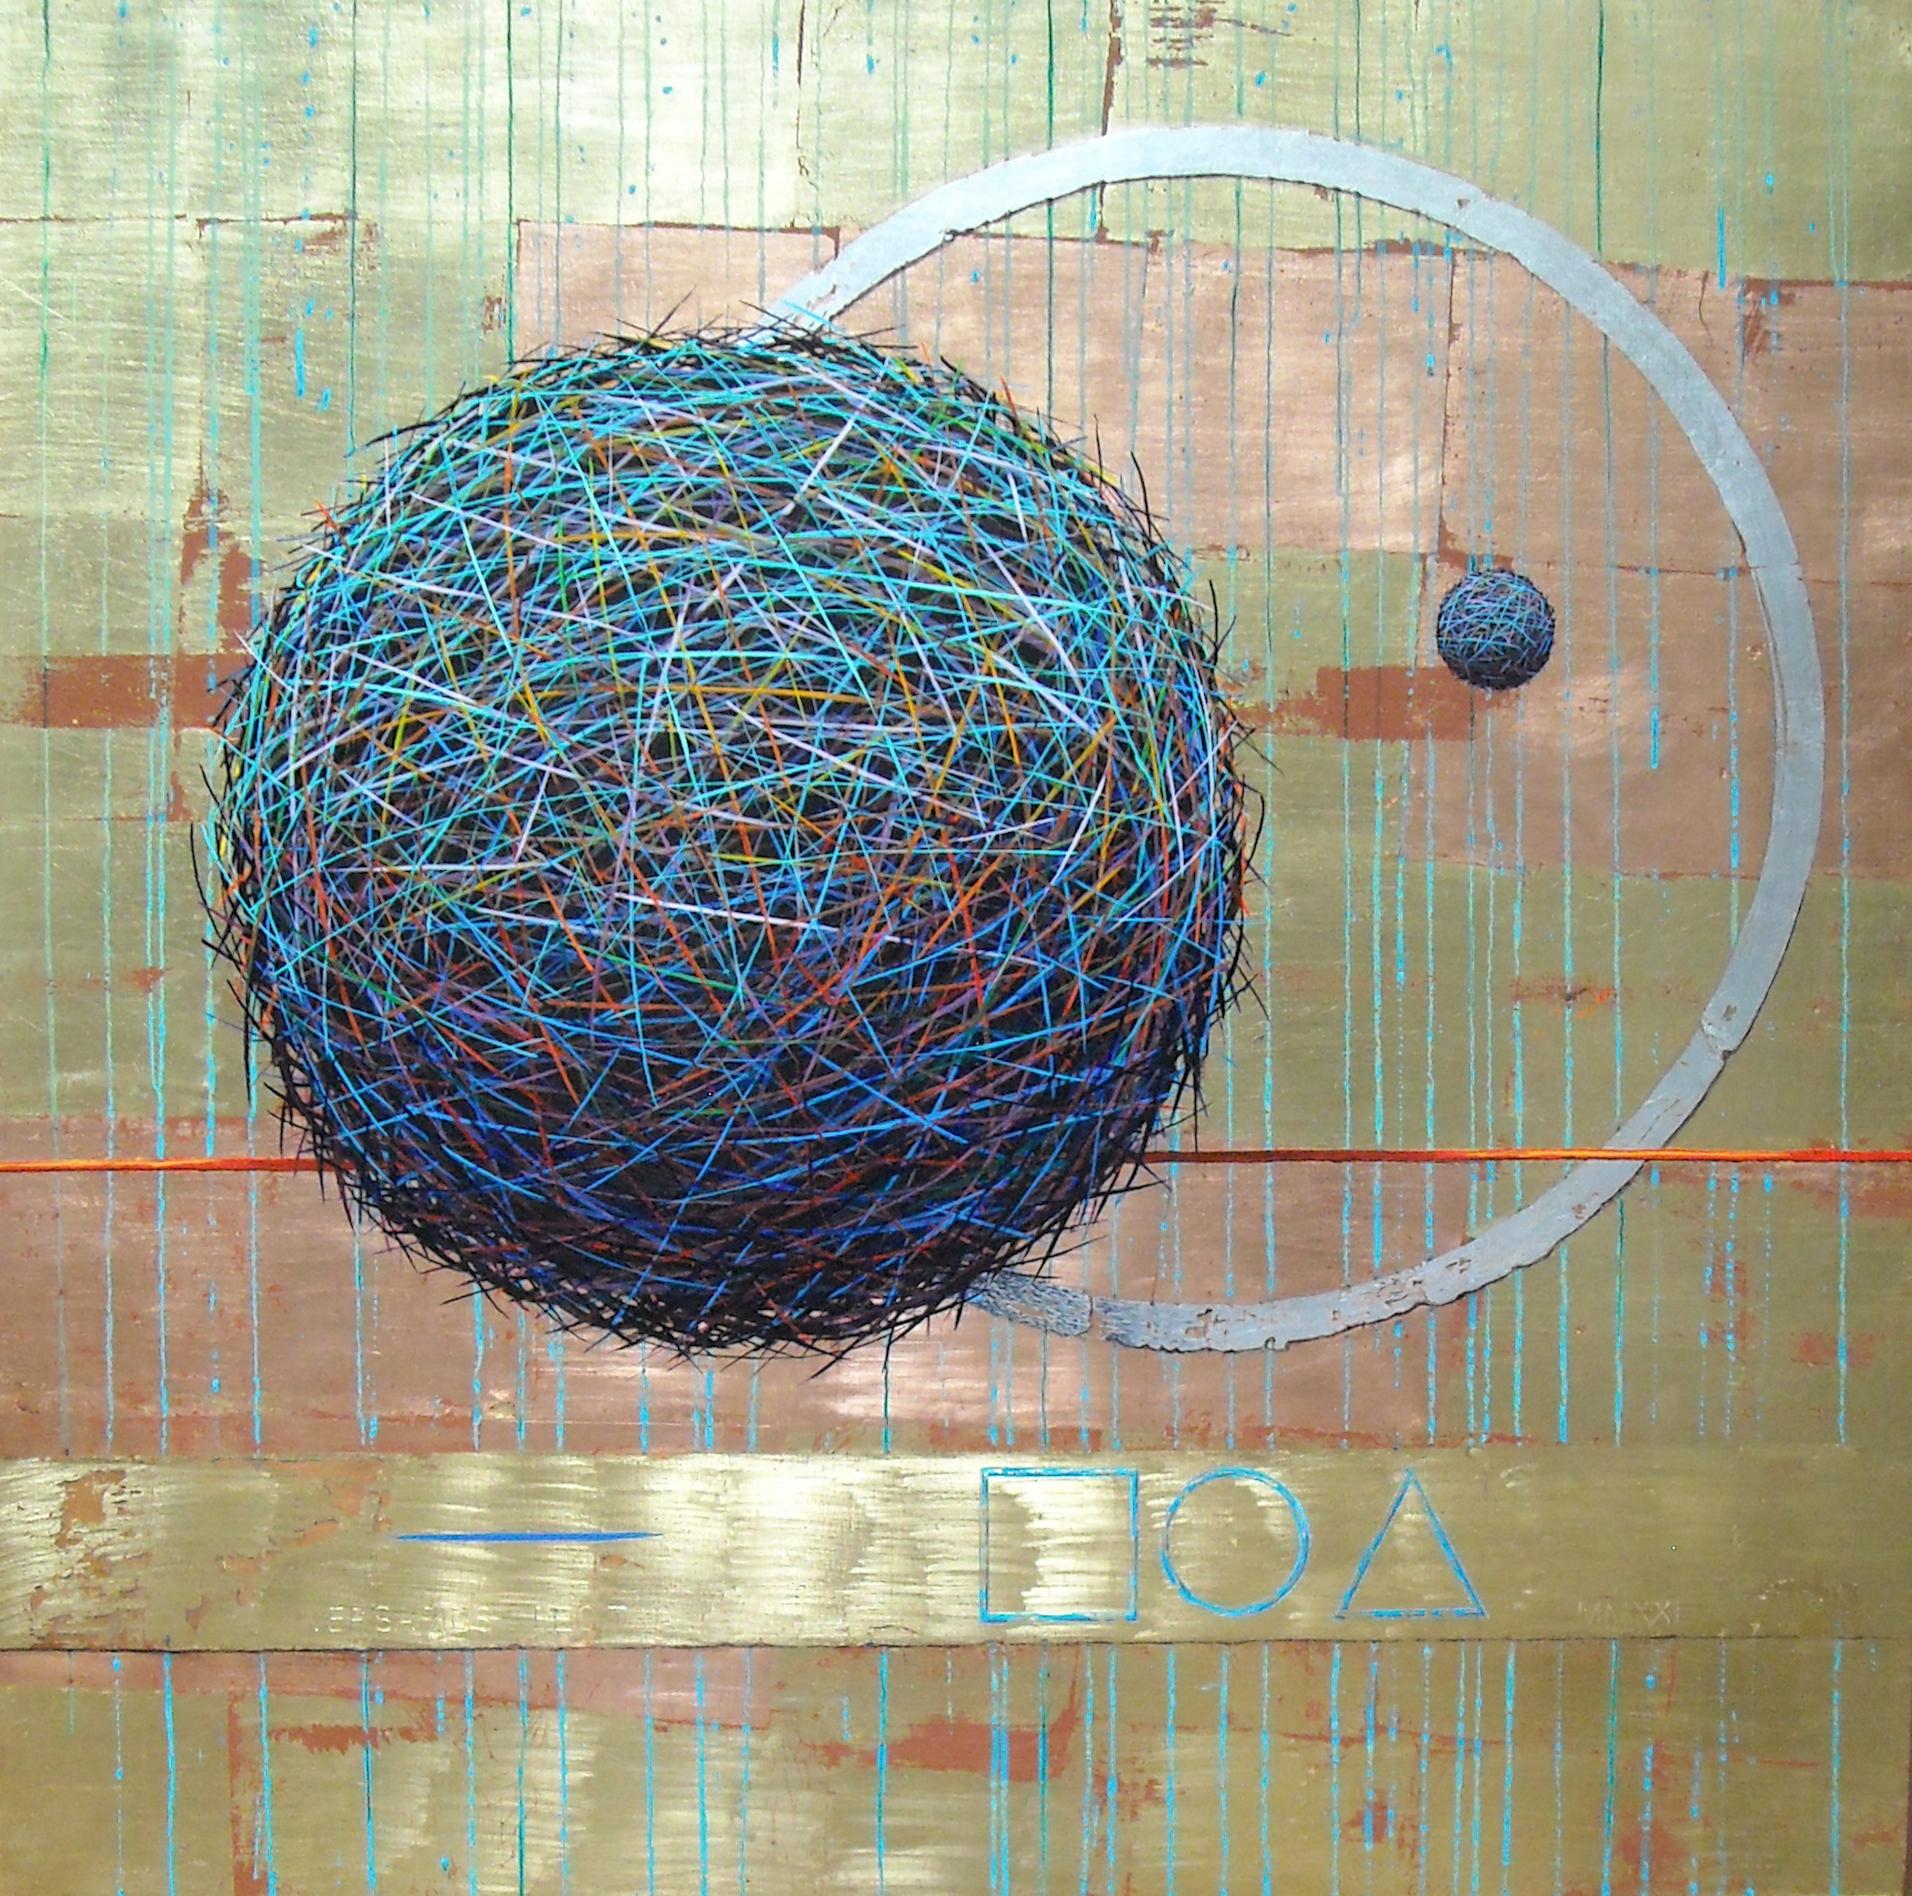 2-Equilibrio-doratura-e-pigmento-su-tavola-cm.-100X100-2021.jpg